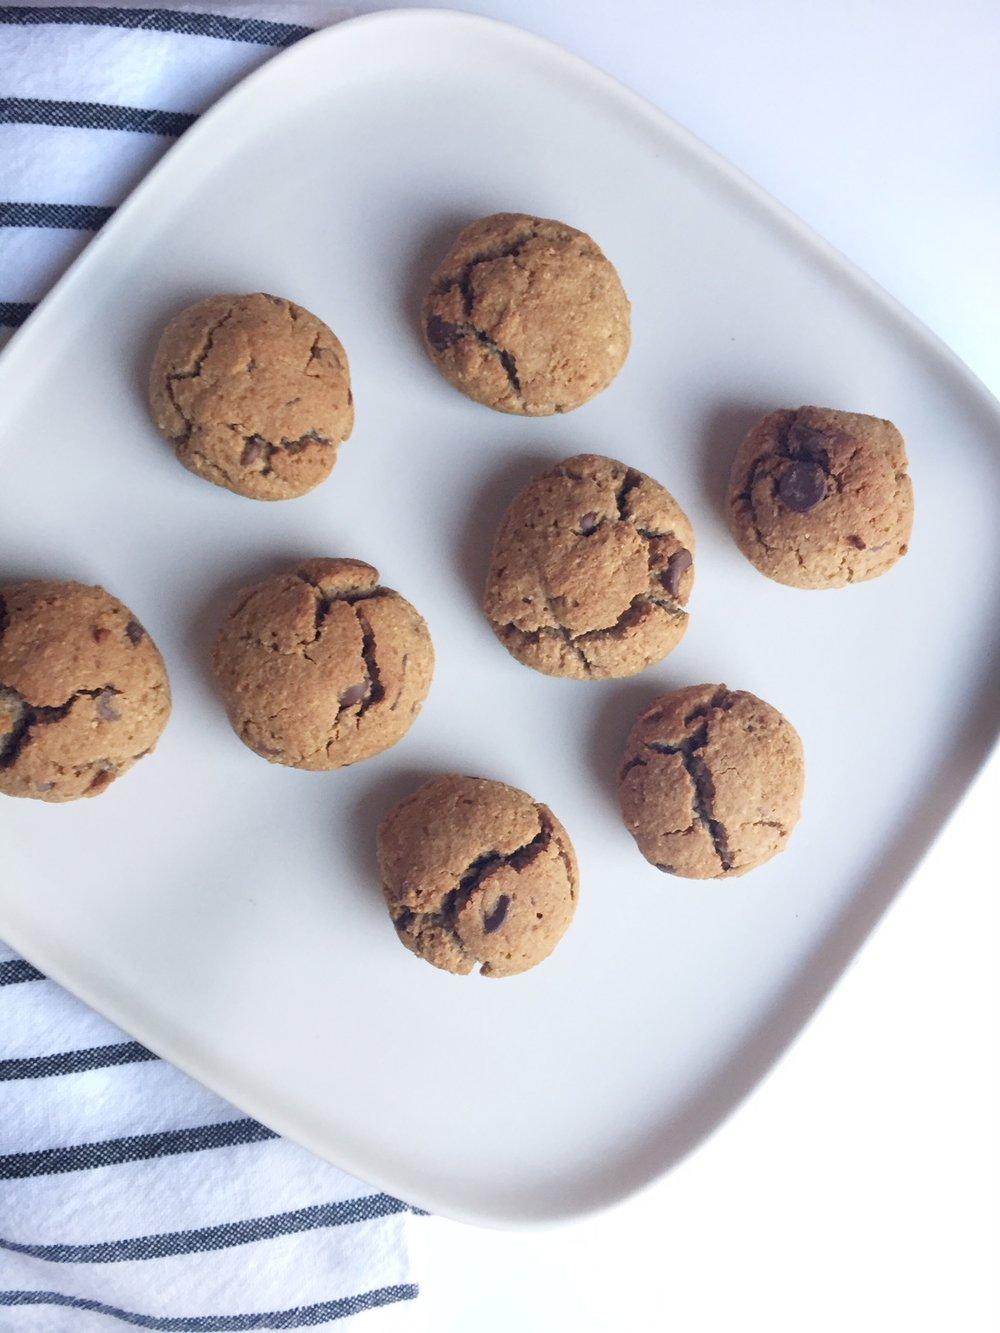 Banana Flour Gluten Free Vegan Cookies